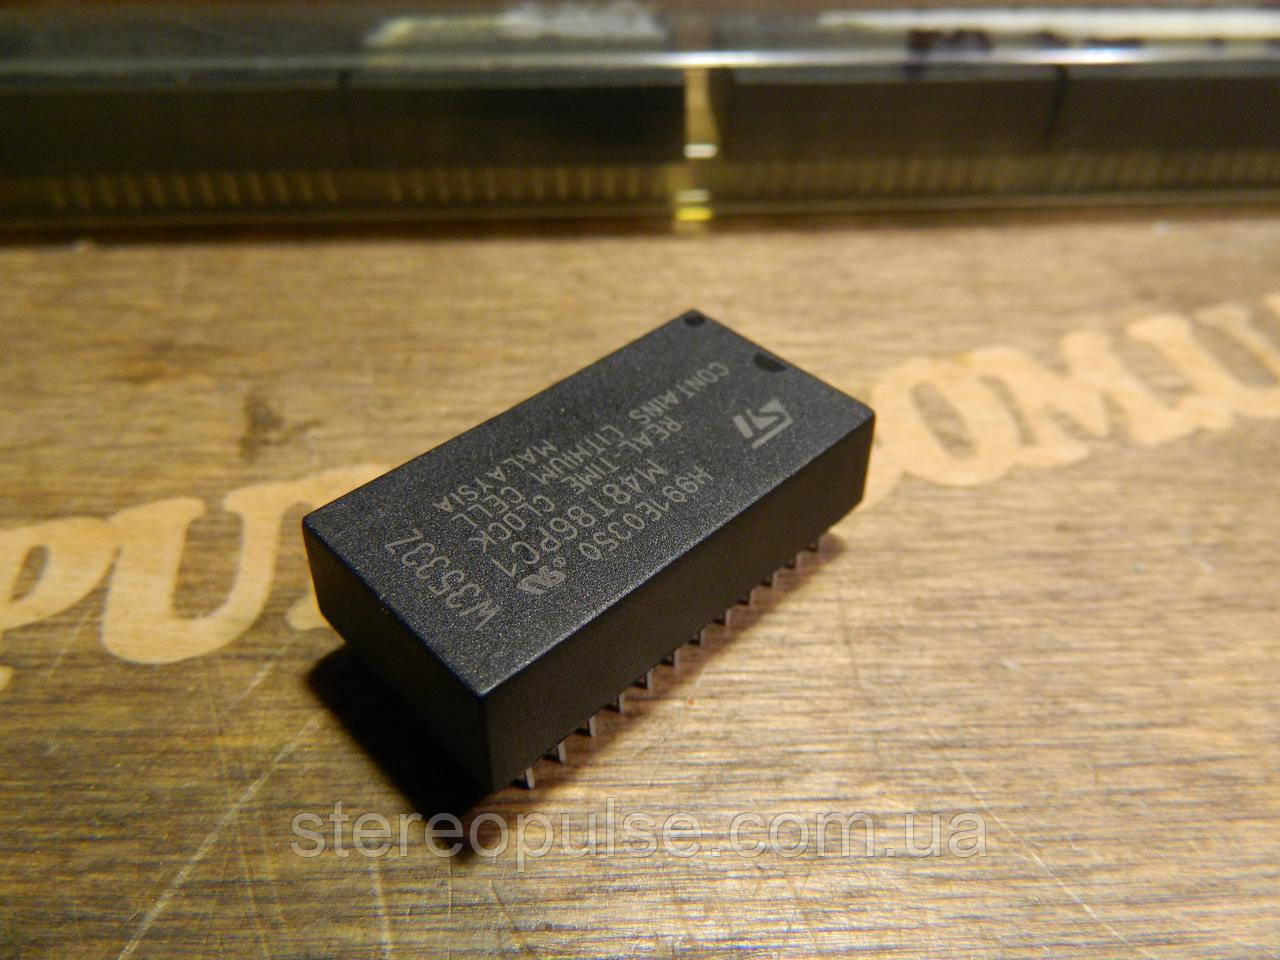 Мікросхема M48T86PC1 real - time clock